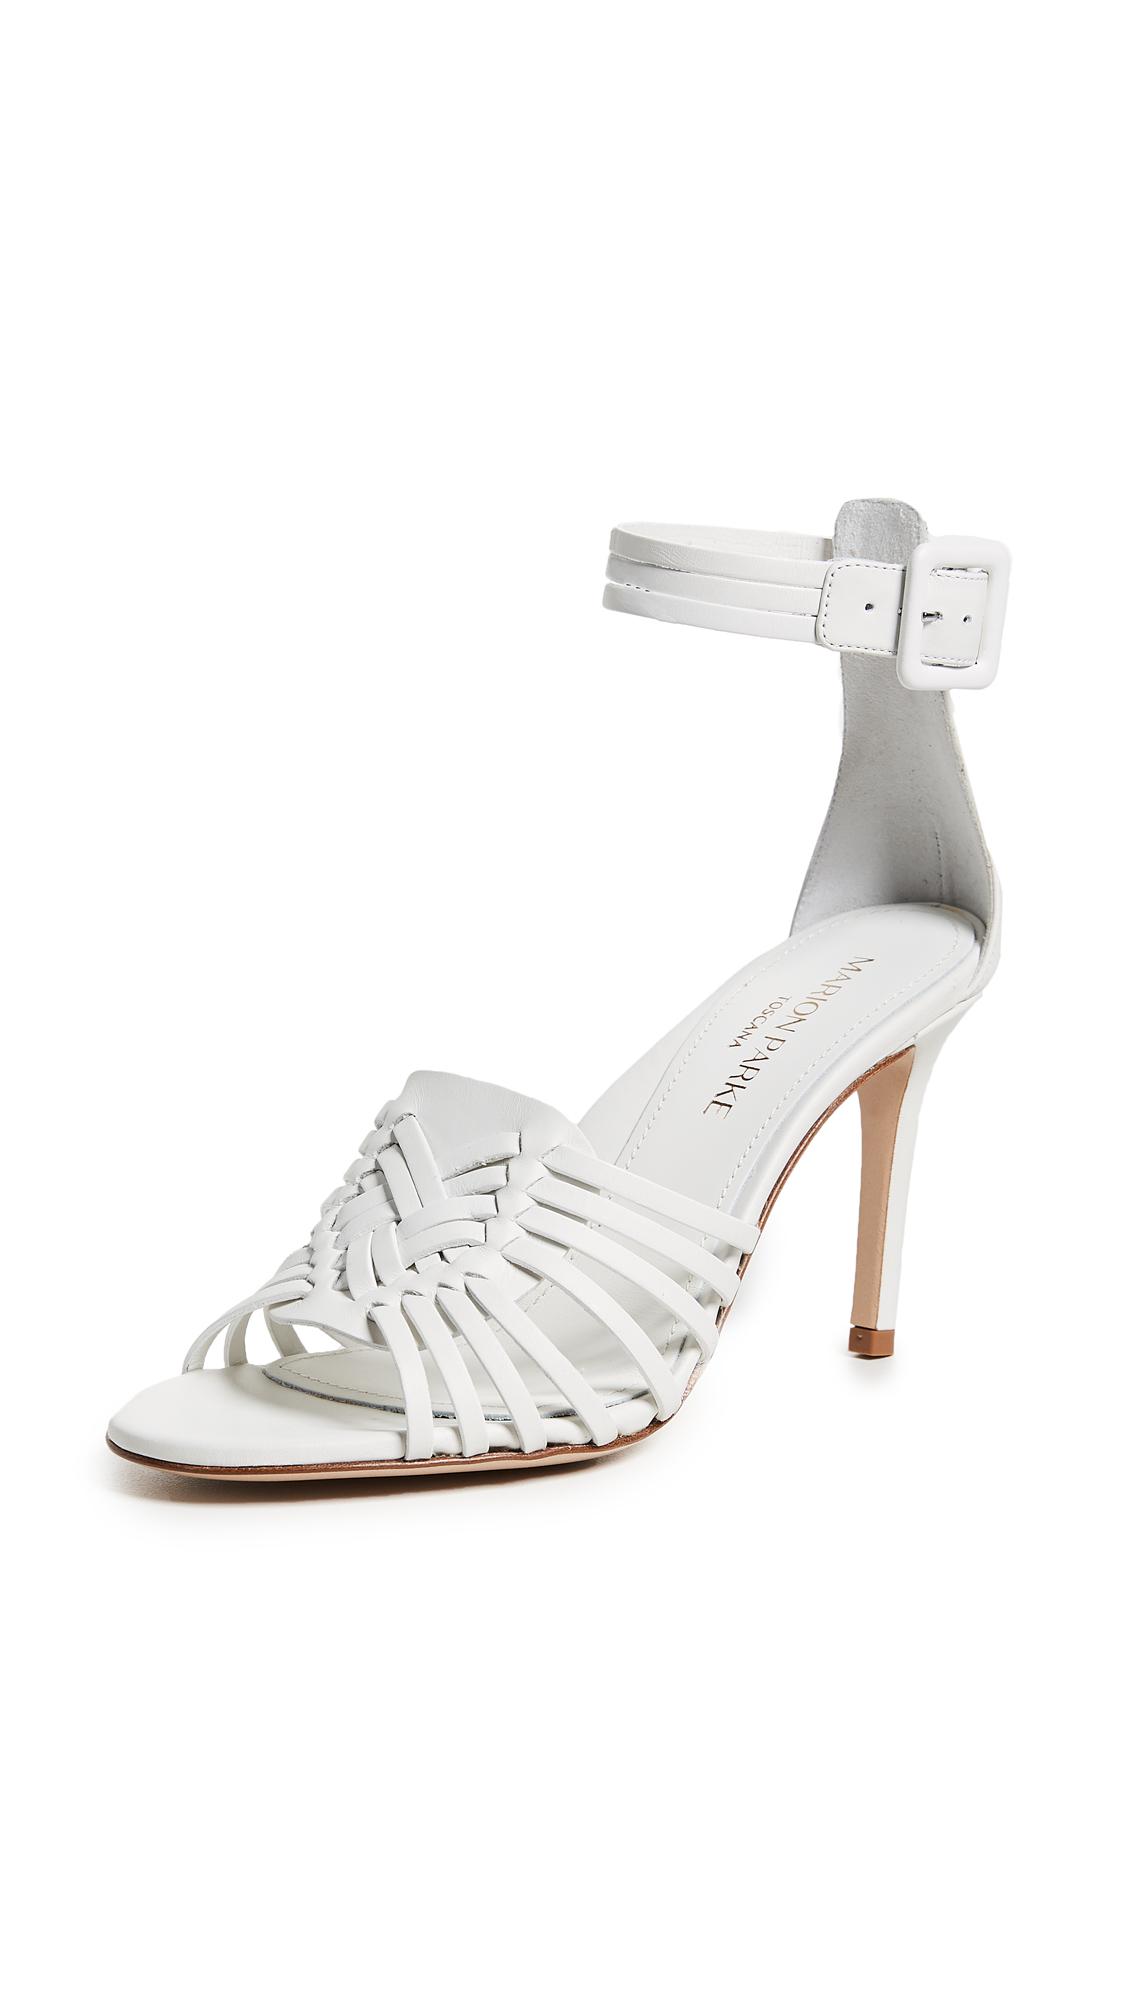 Marion Parke Lewis Sandals - White